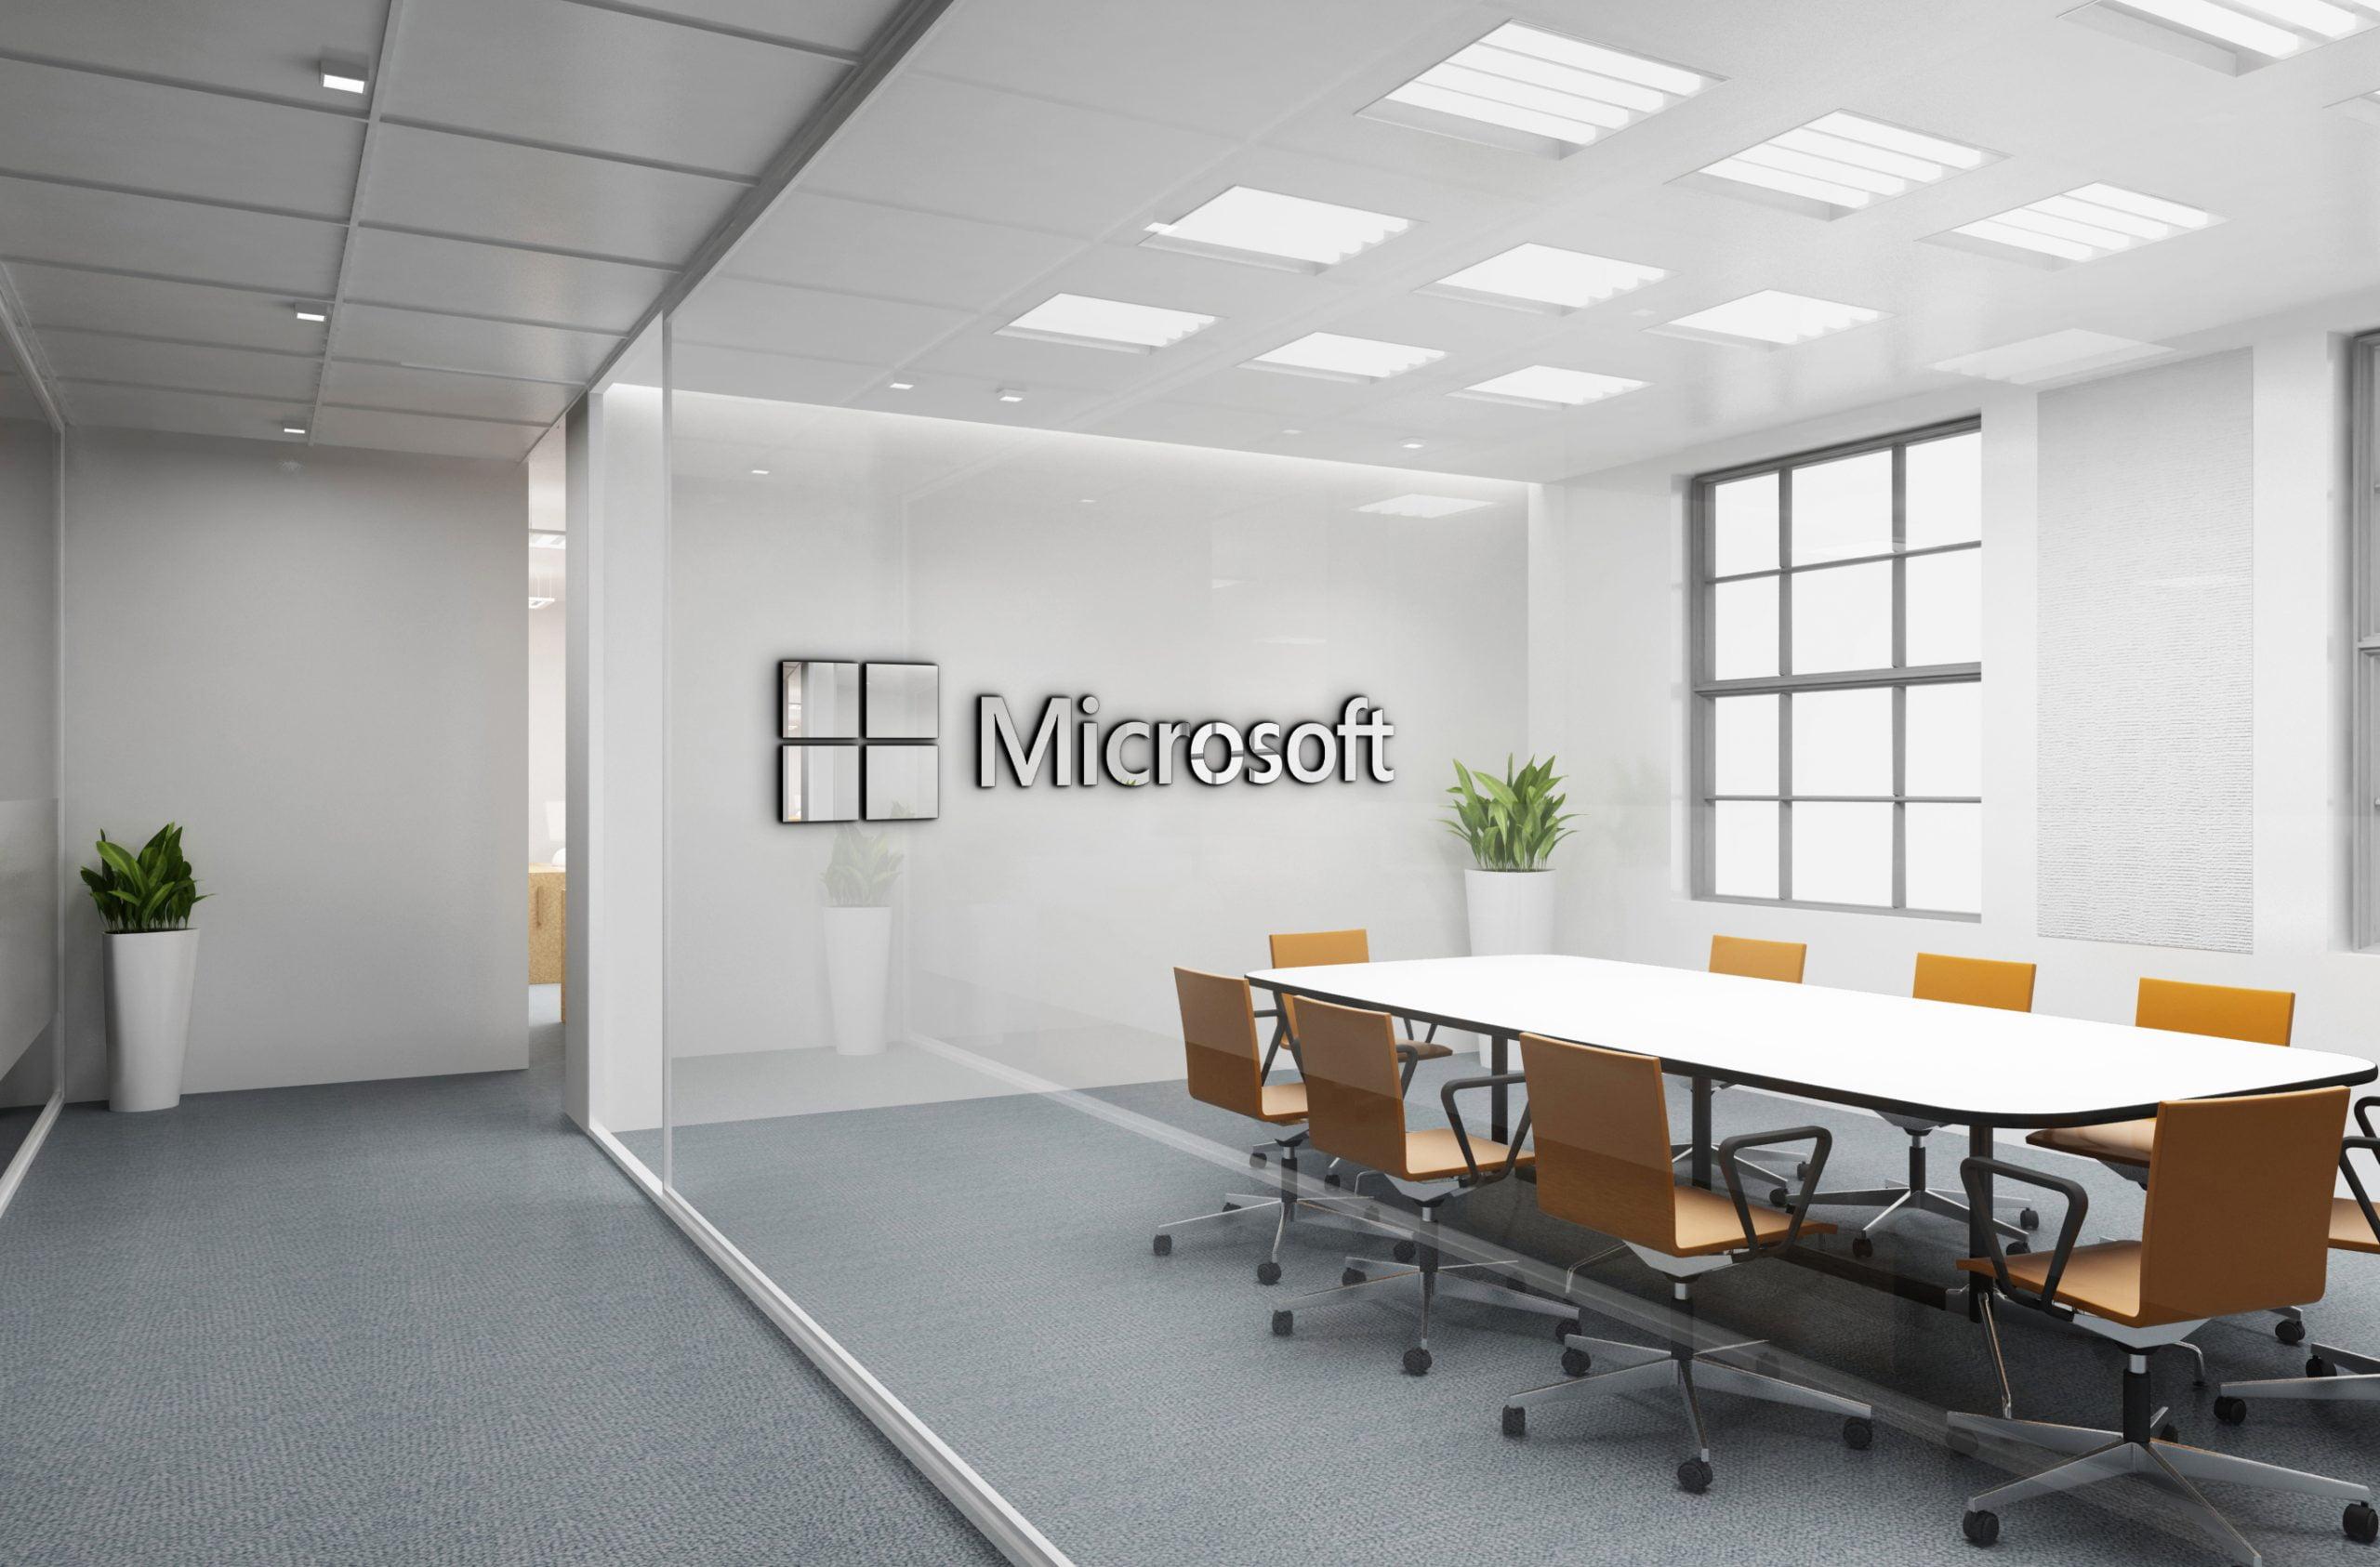 Microsoft Free Office Logo Mockup